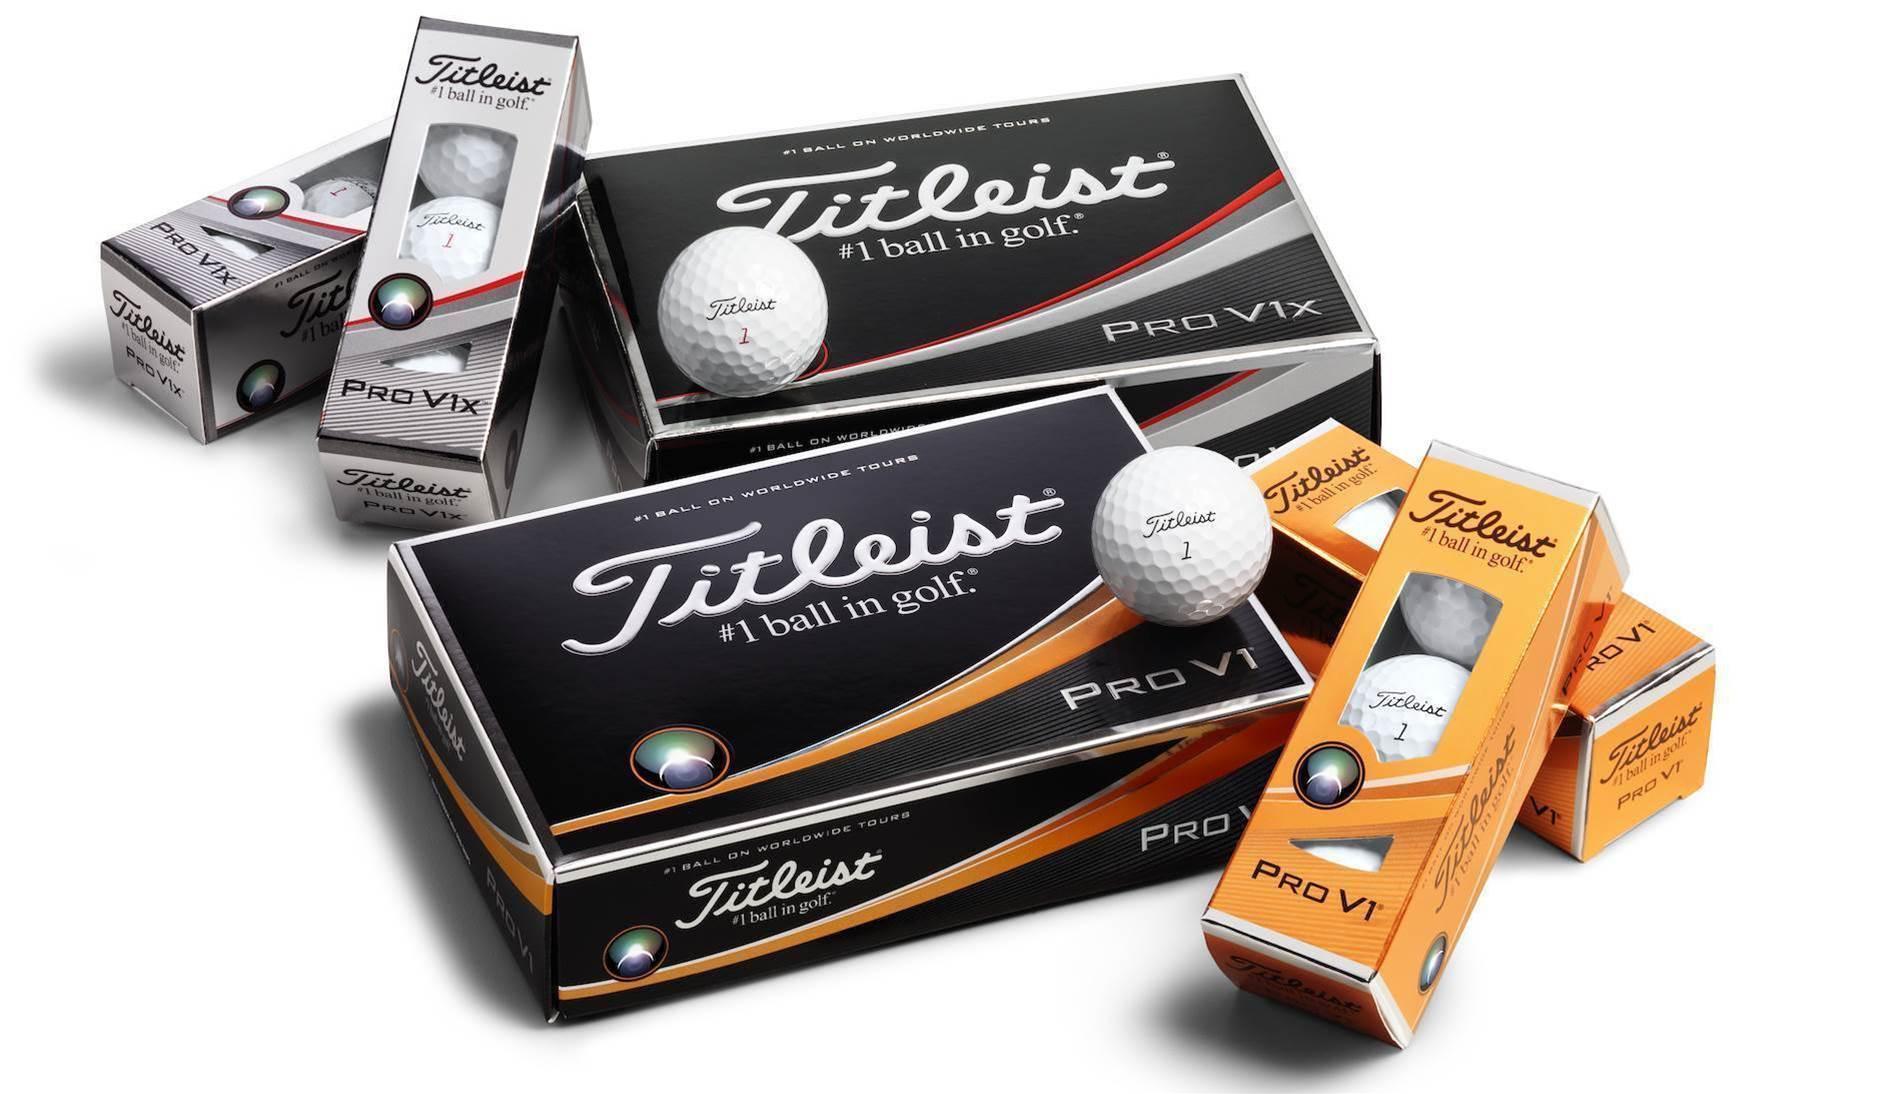 NEW GEAR: Titleist unveils 2017 Pro V1 & Pro V1x balls